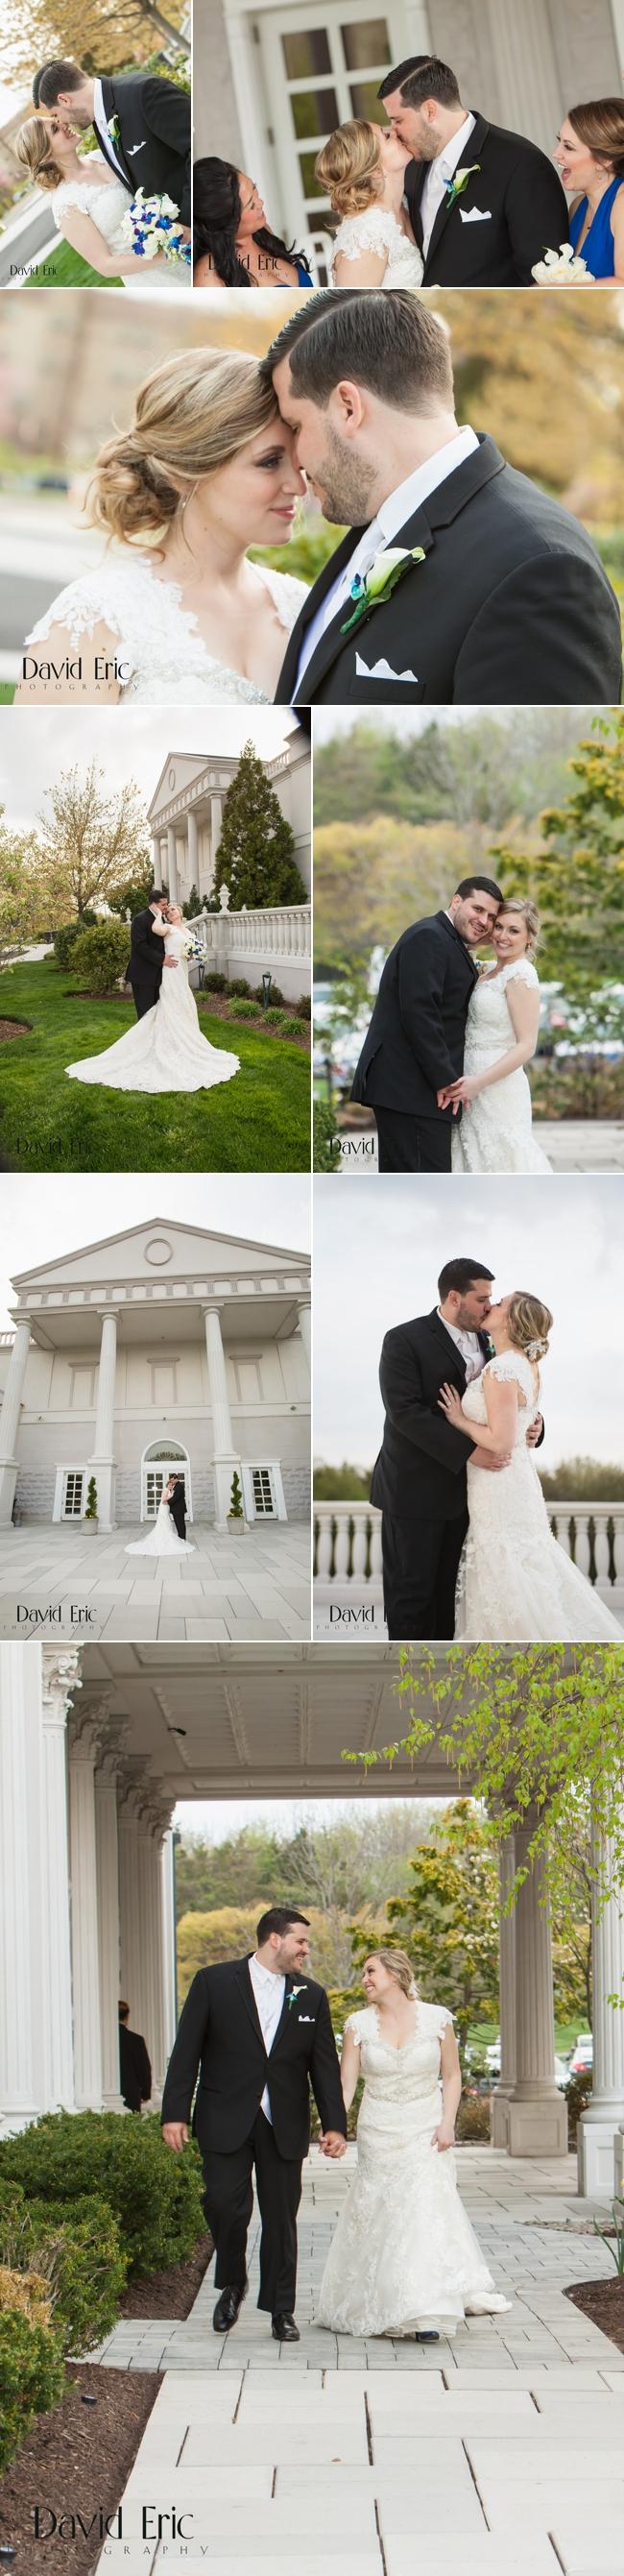 David Eric Photography - Morristown New Jersey - Amanda and Micheal 4